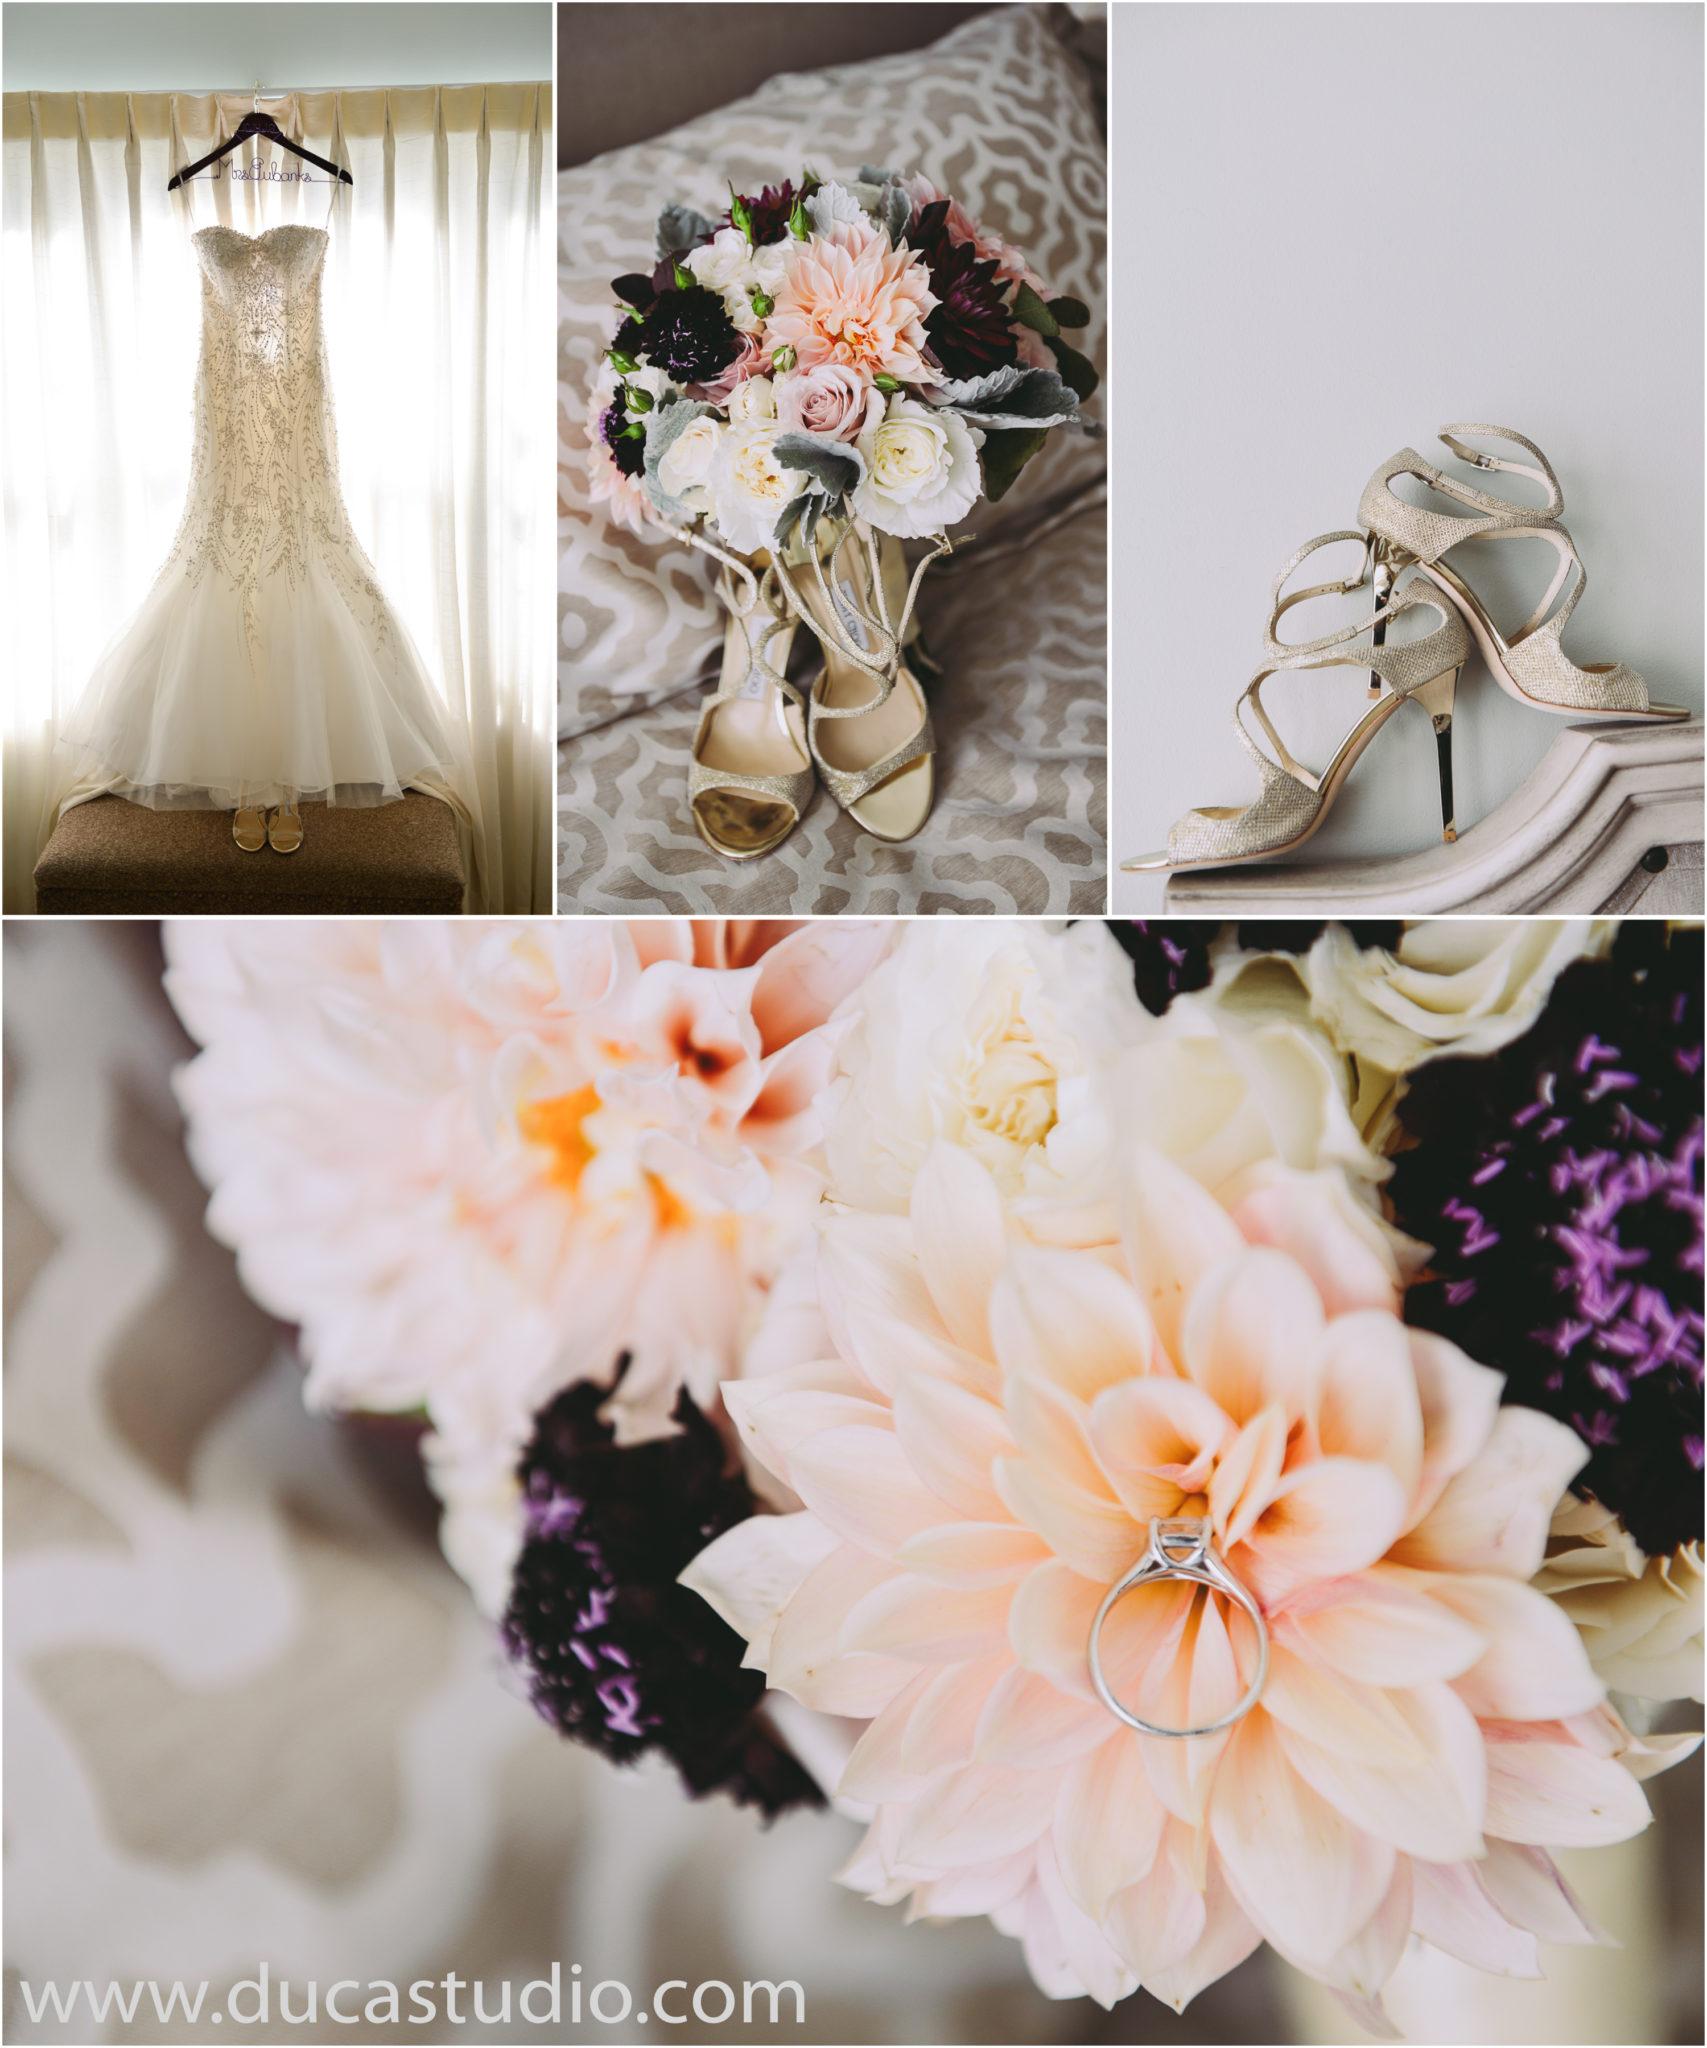 hyatt-at-the-bellevue-wedding-bride